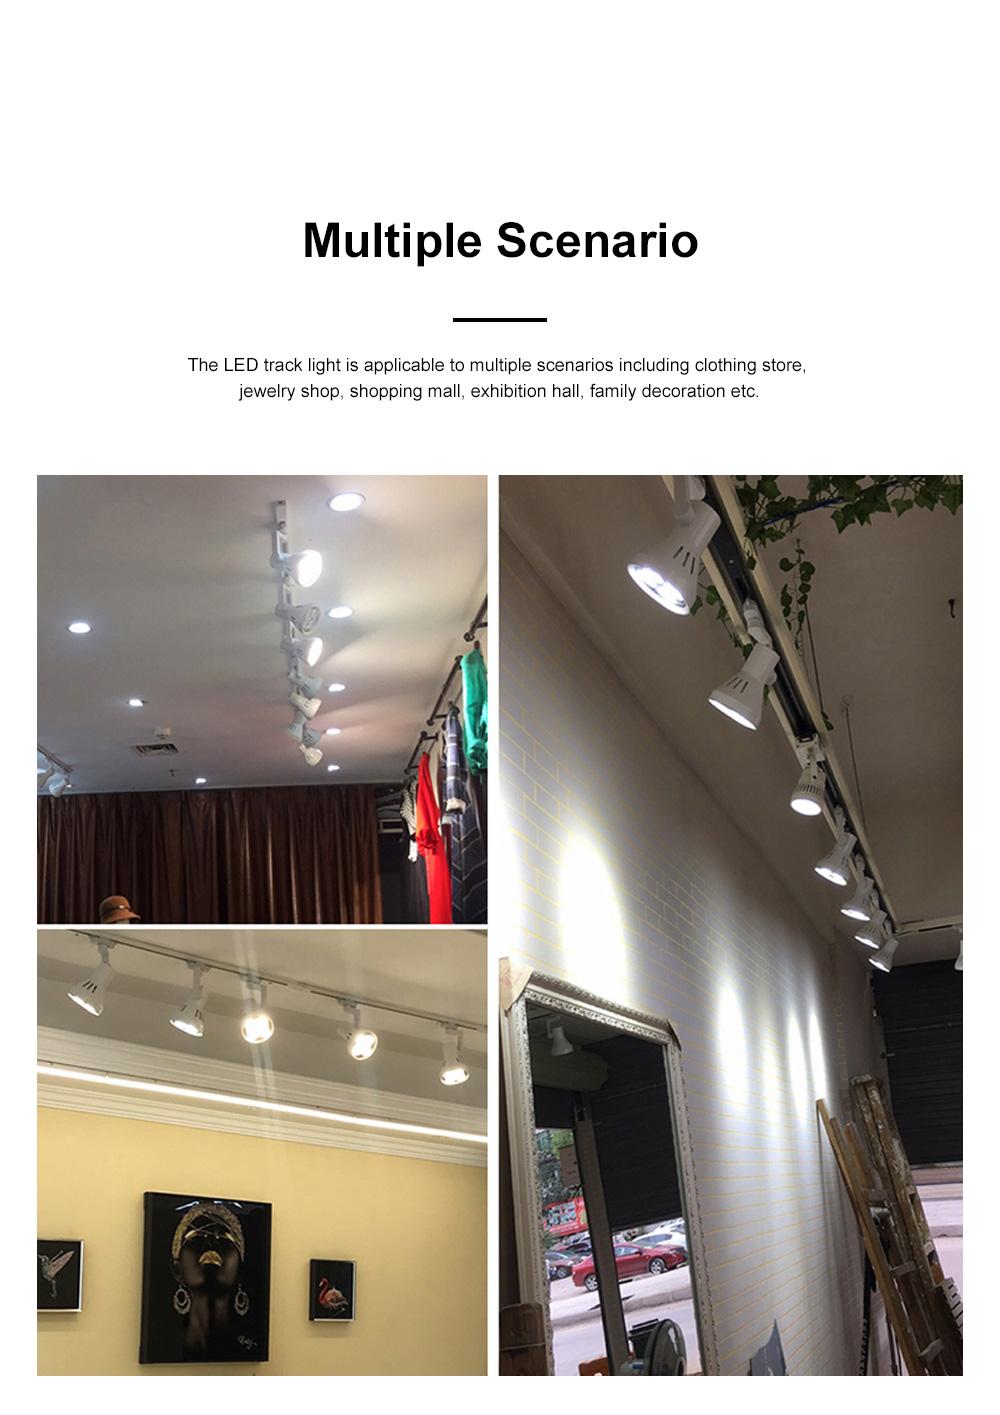 PAR30 Ultra-bright LED Track Lighting for Clothing Store Art Gallery Warm Light LED Track Lamp Free Rotation Lazy Arm Tracking Spotlight 3